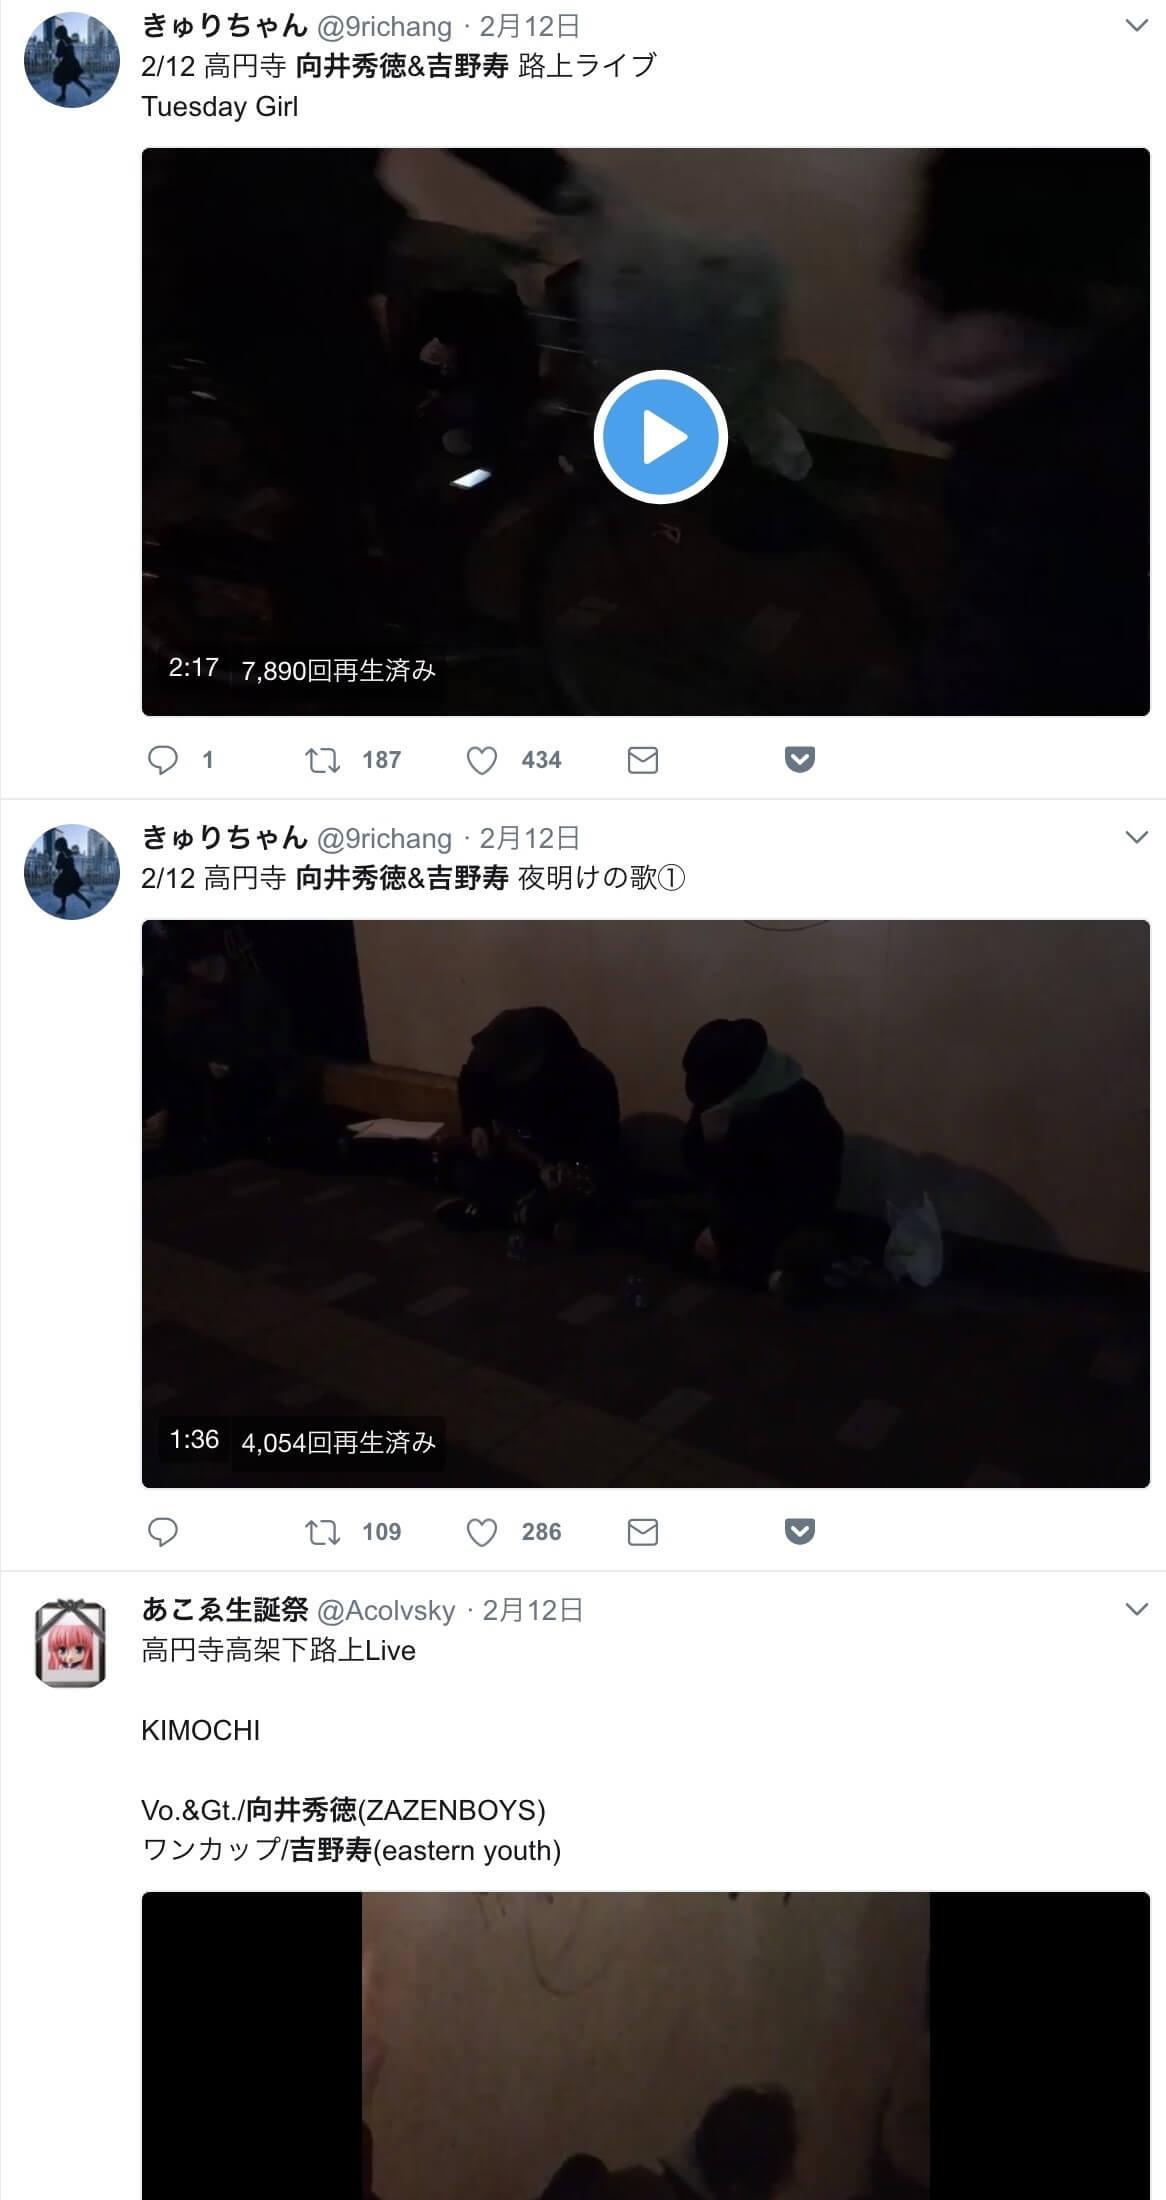 ZAZEN BOYS向井秀徳とeastern youth吉野寿が2/12 高円寺で路上ライブをする(まとめ)